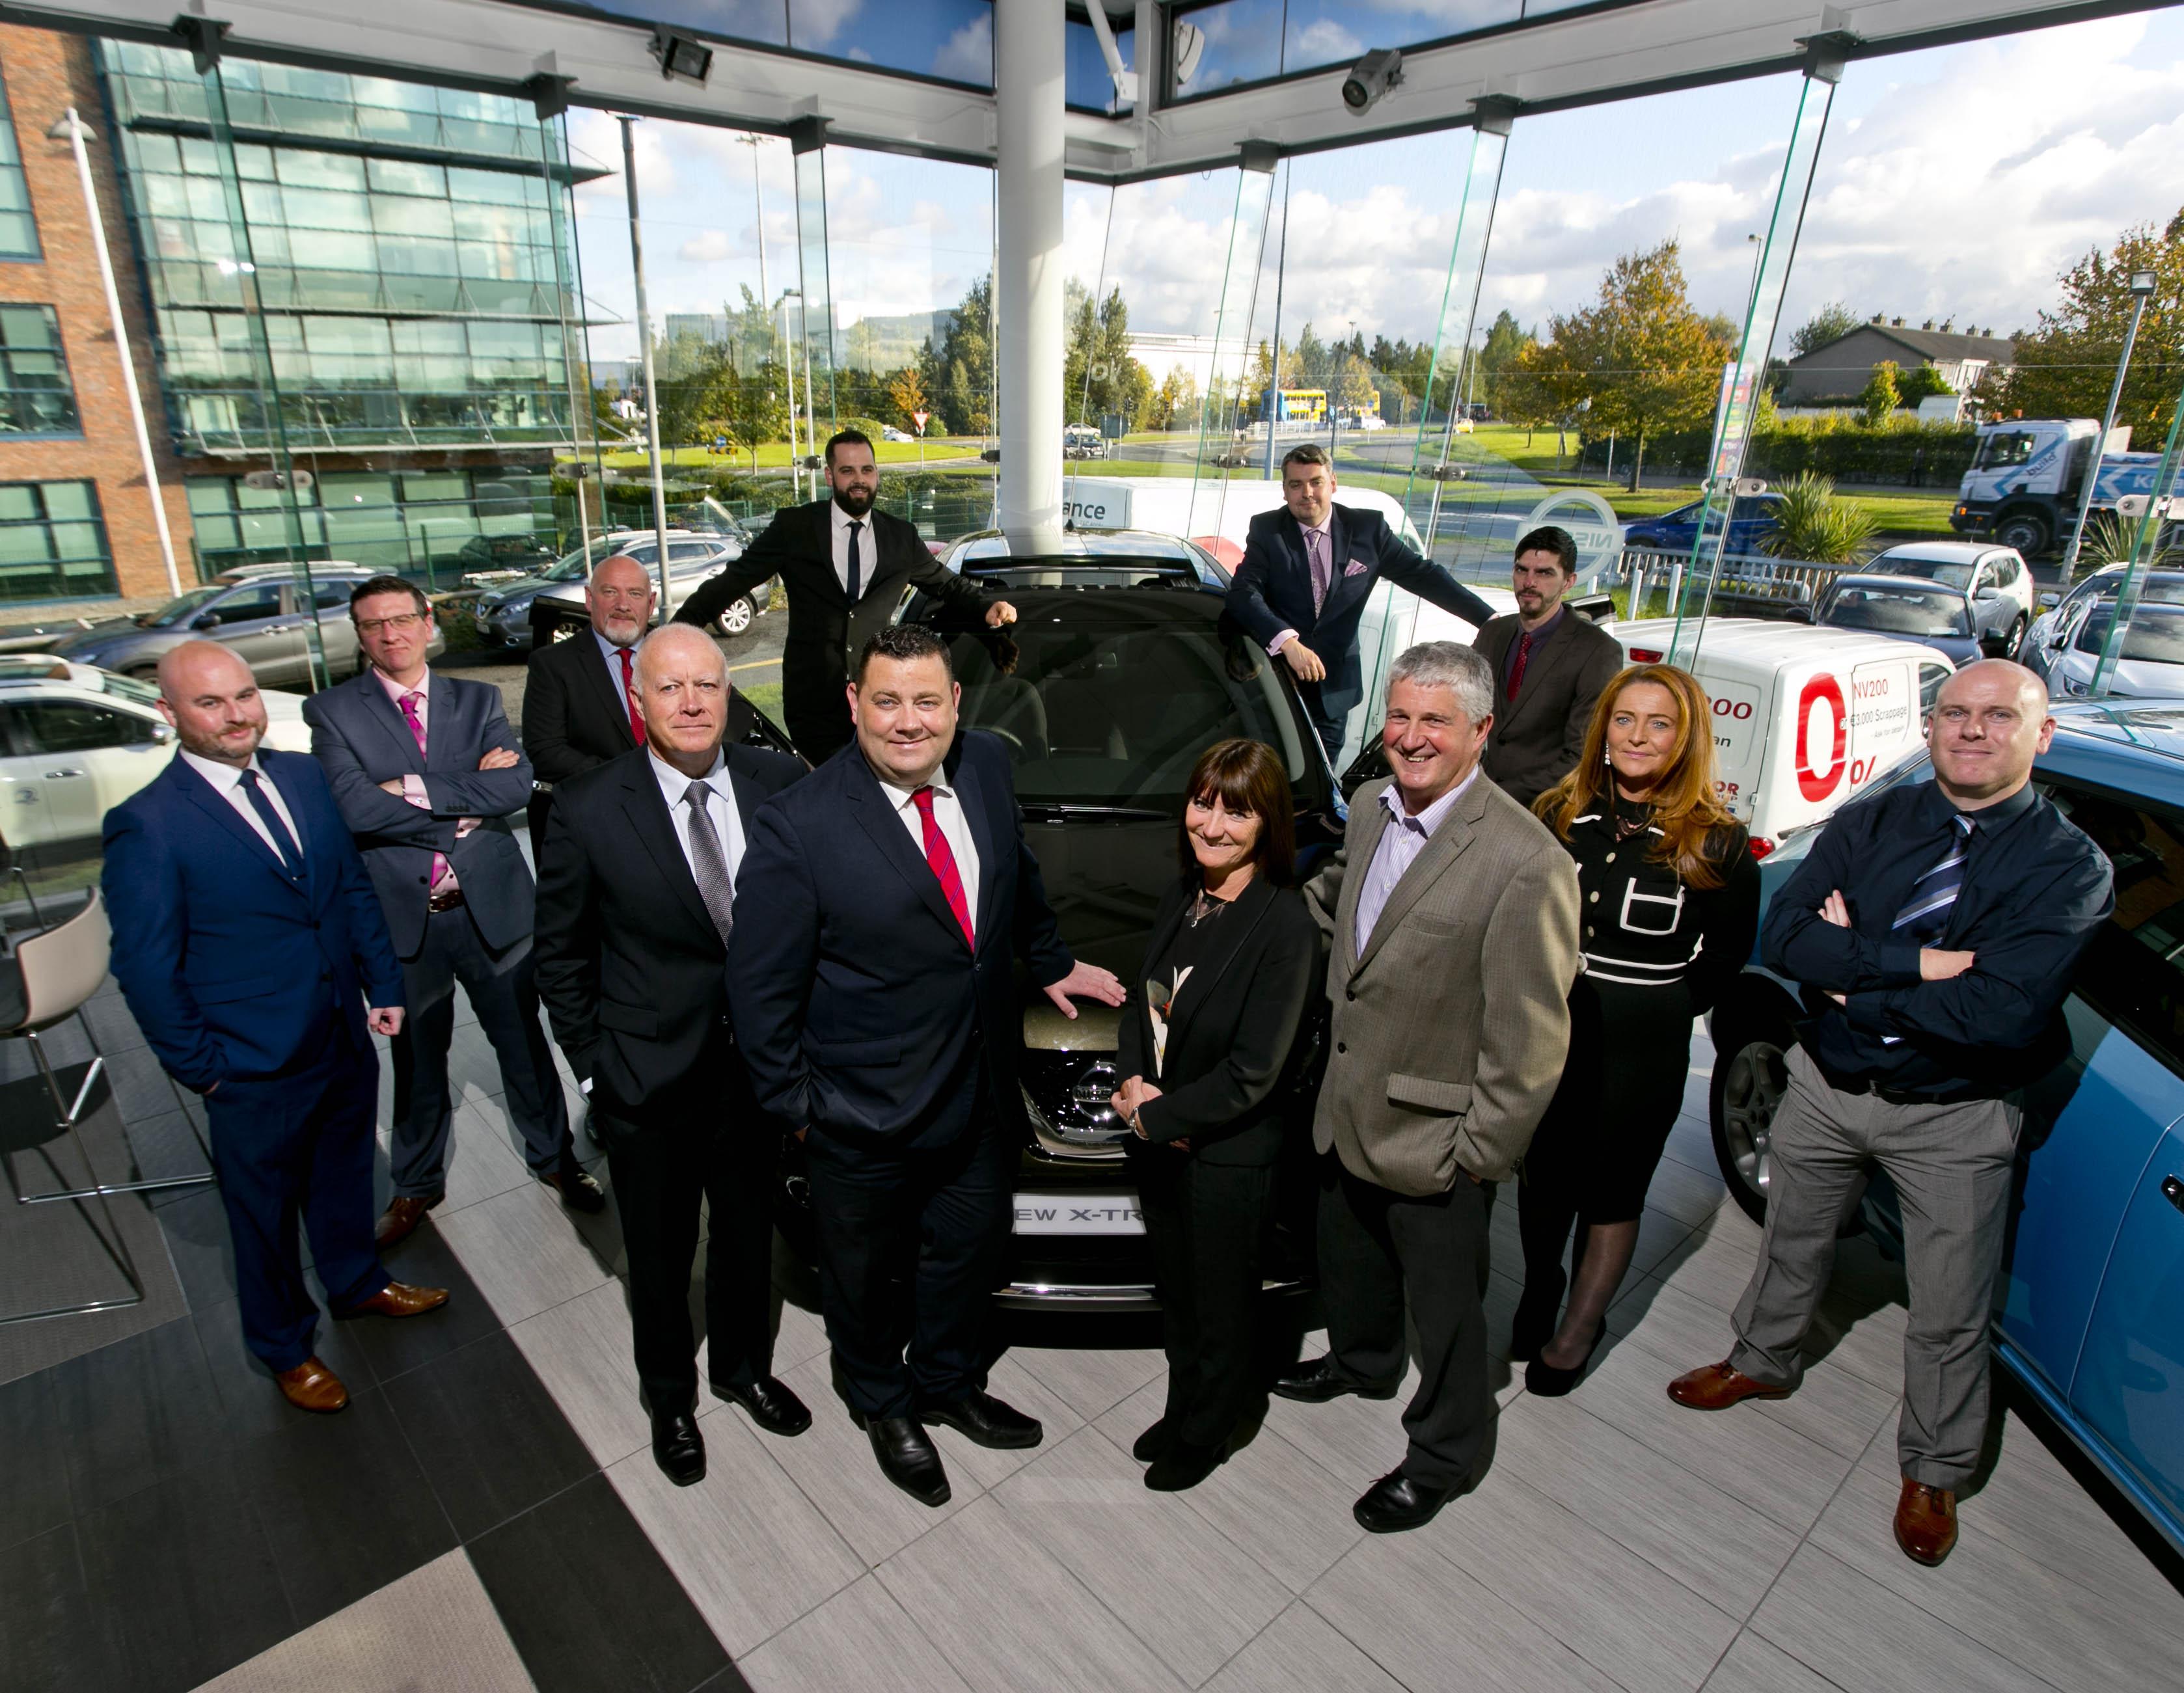 Used Car Dealerships Windsor >> Windsor Motor Group invests in Retail Motor Industry Employee Development - FleetCar.ie